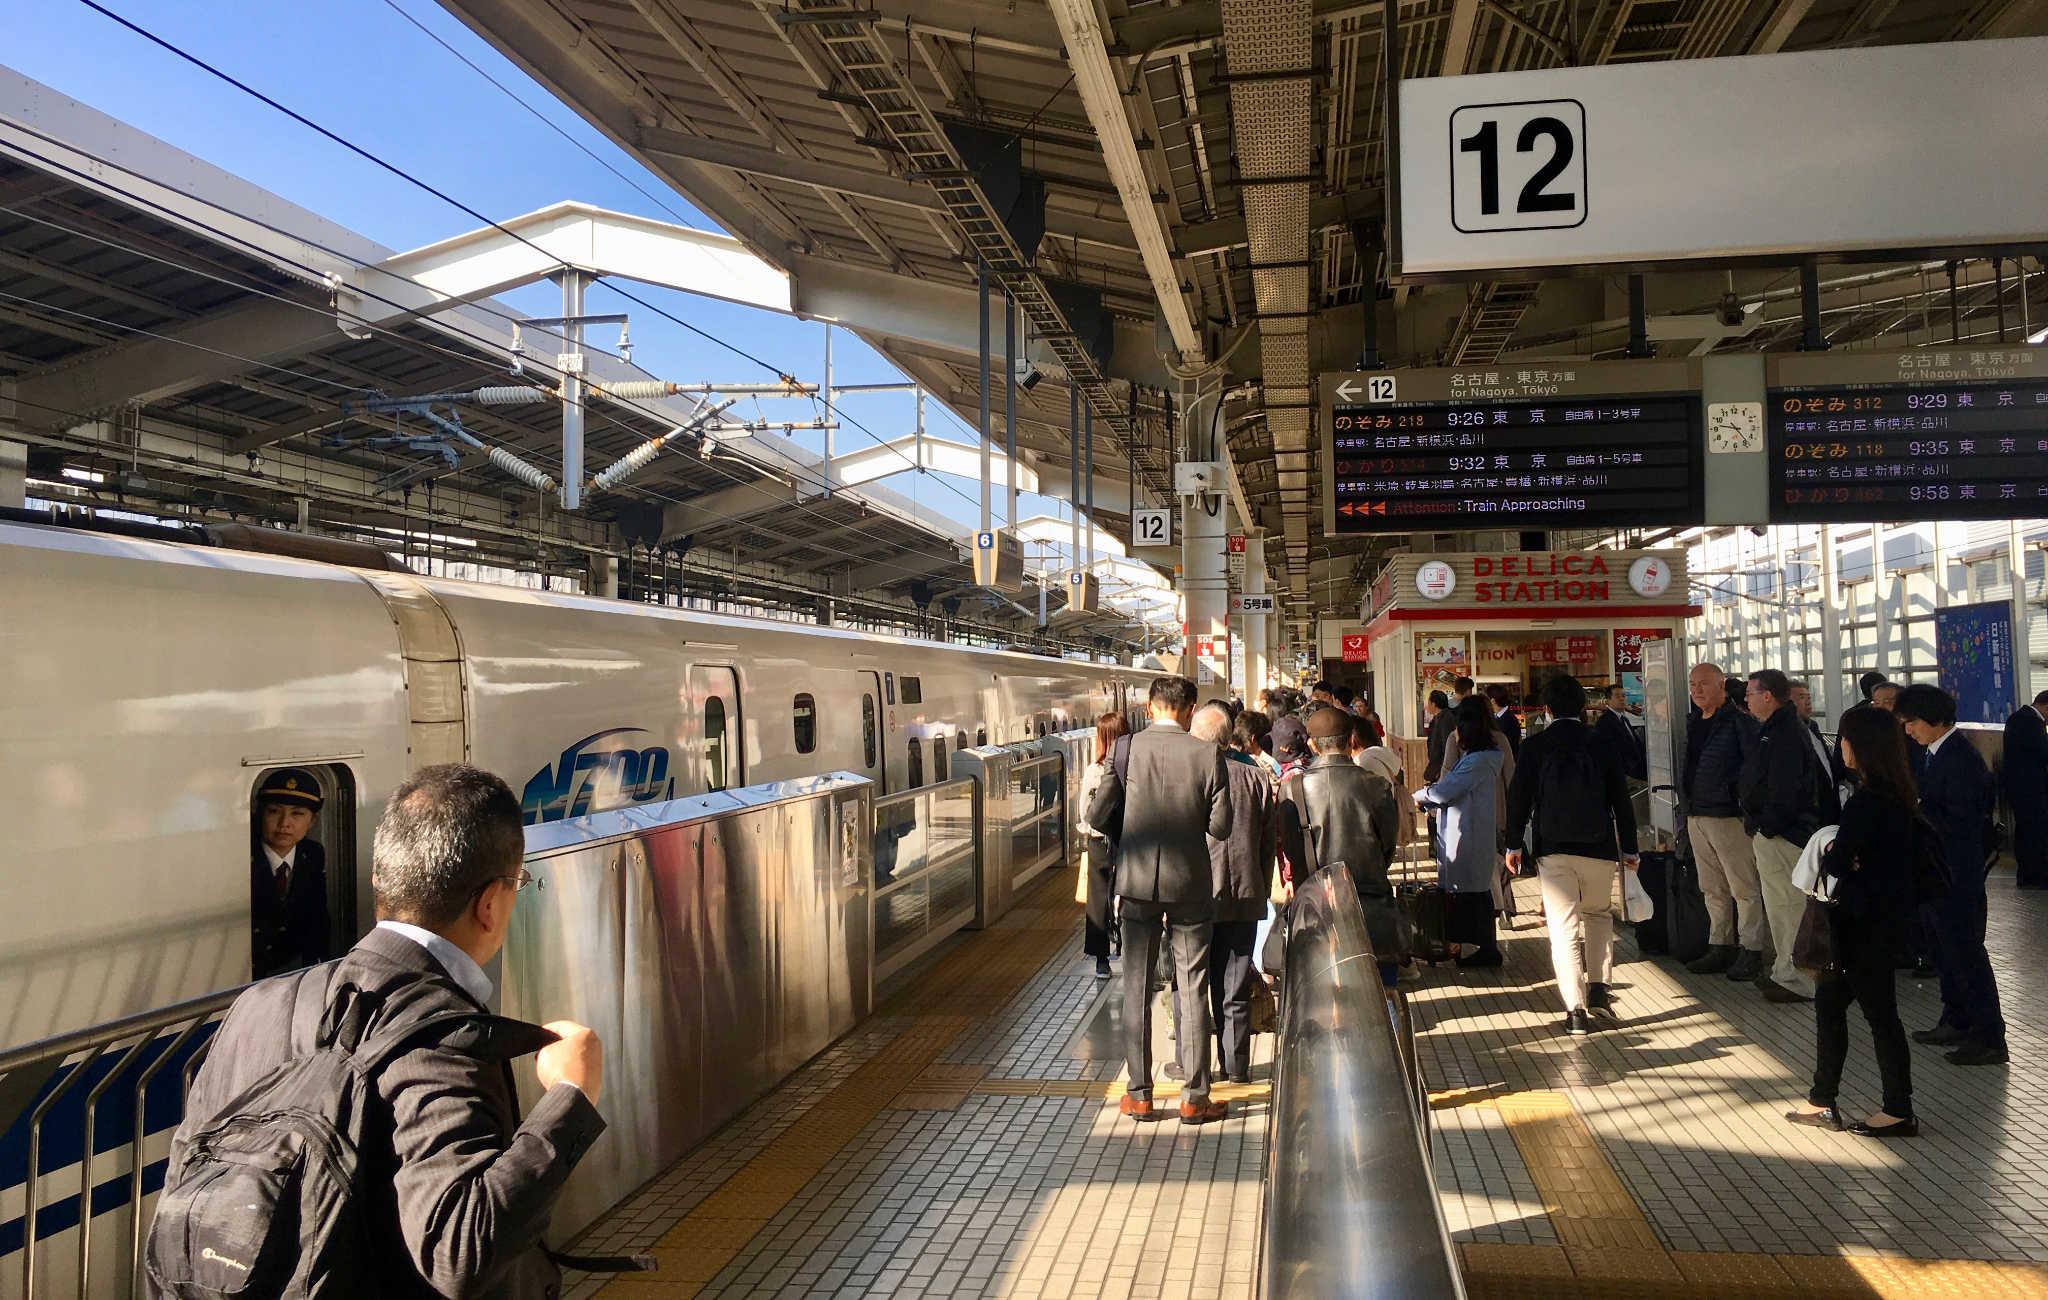 Départ du Shinkansen en direction de Tokyo